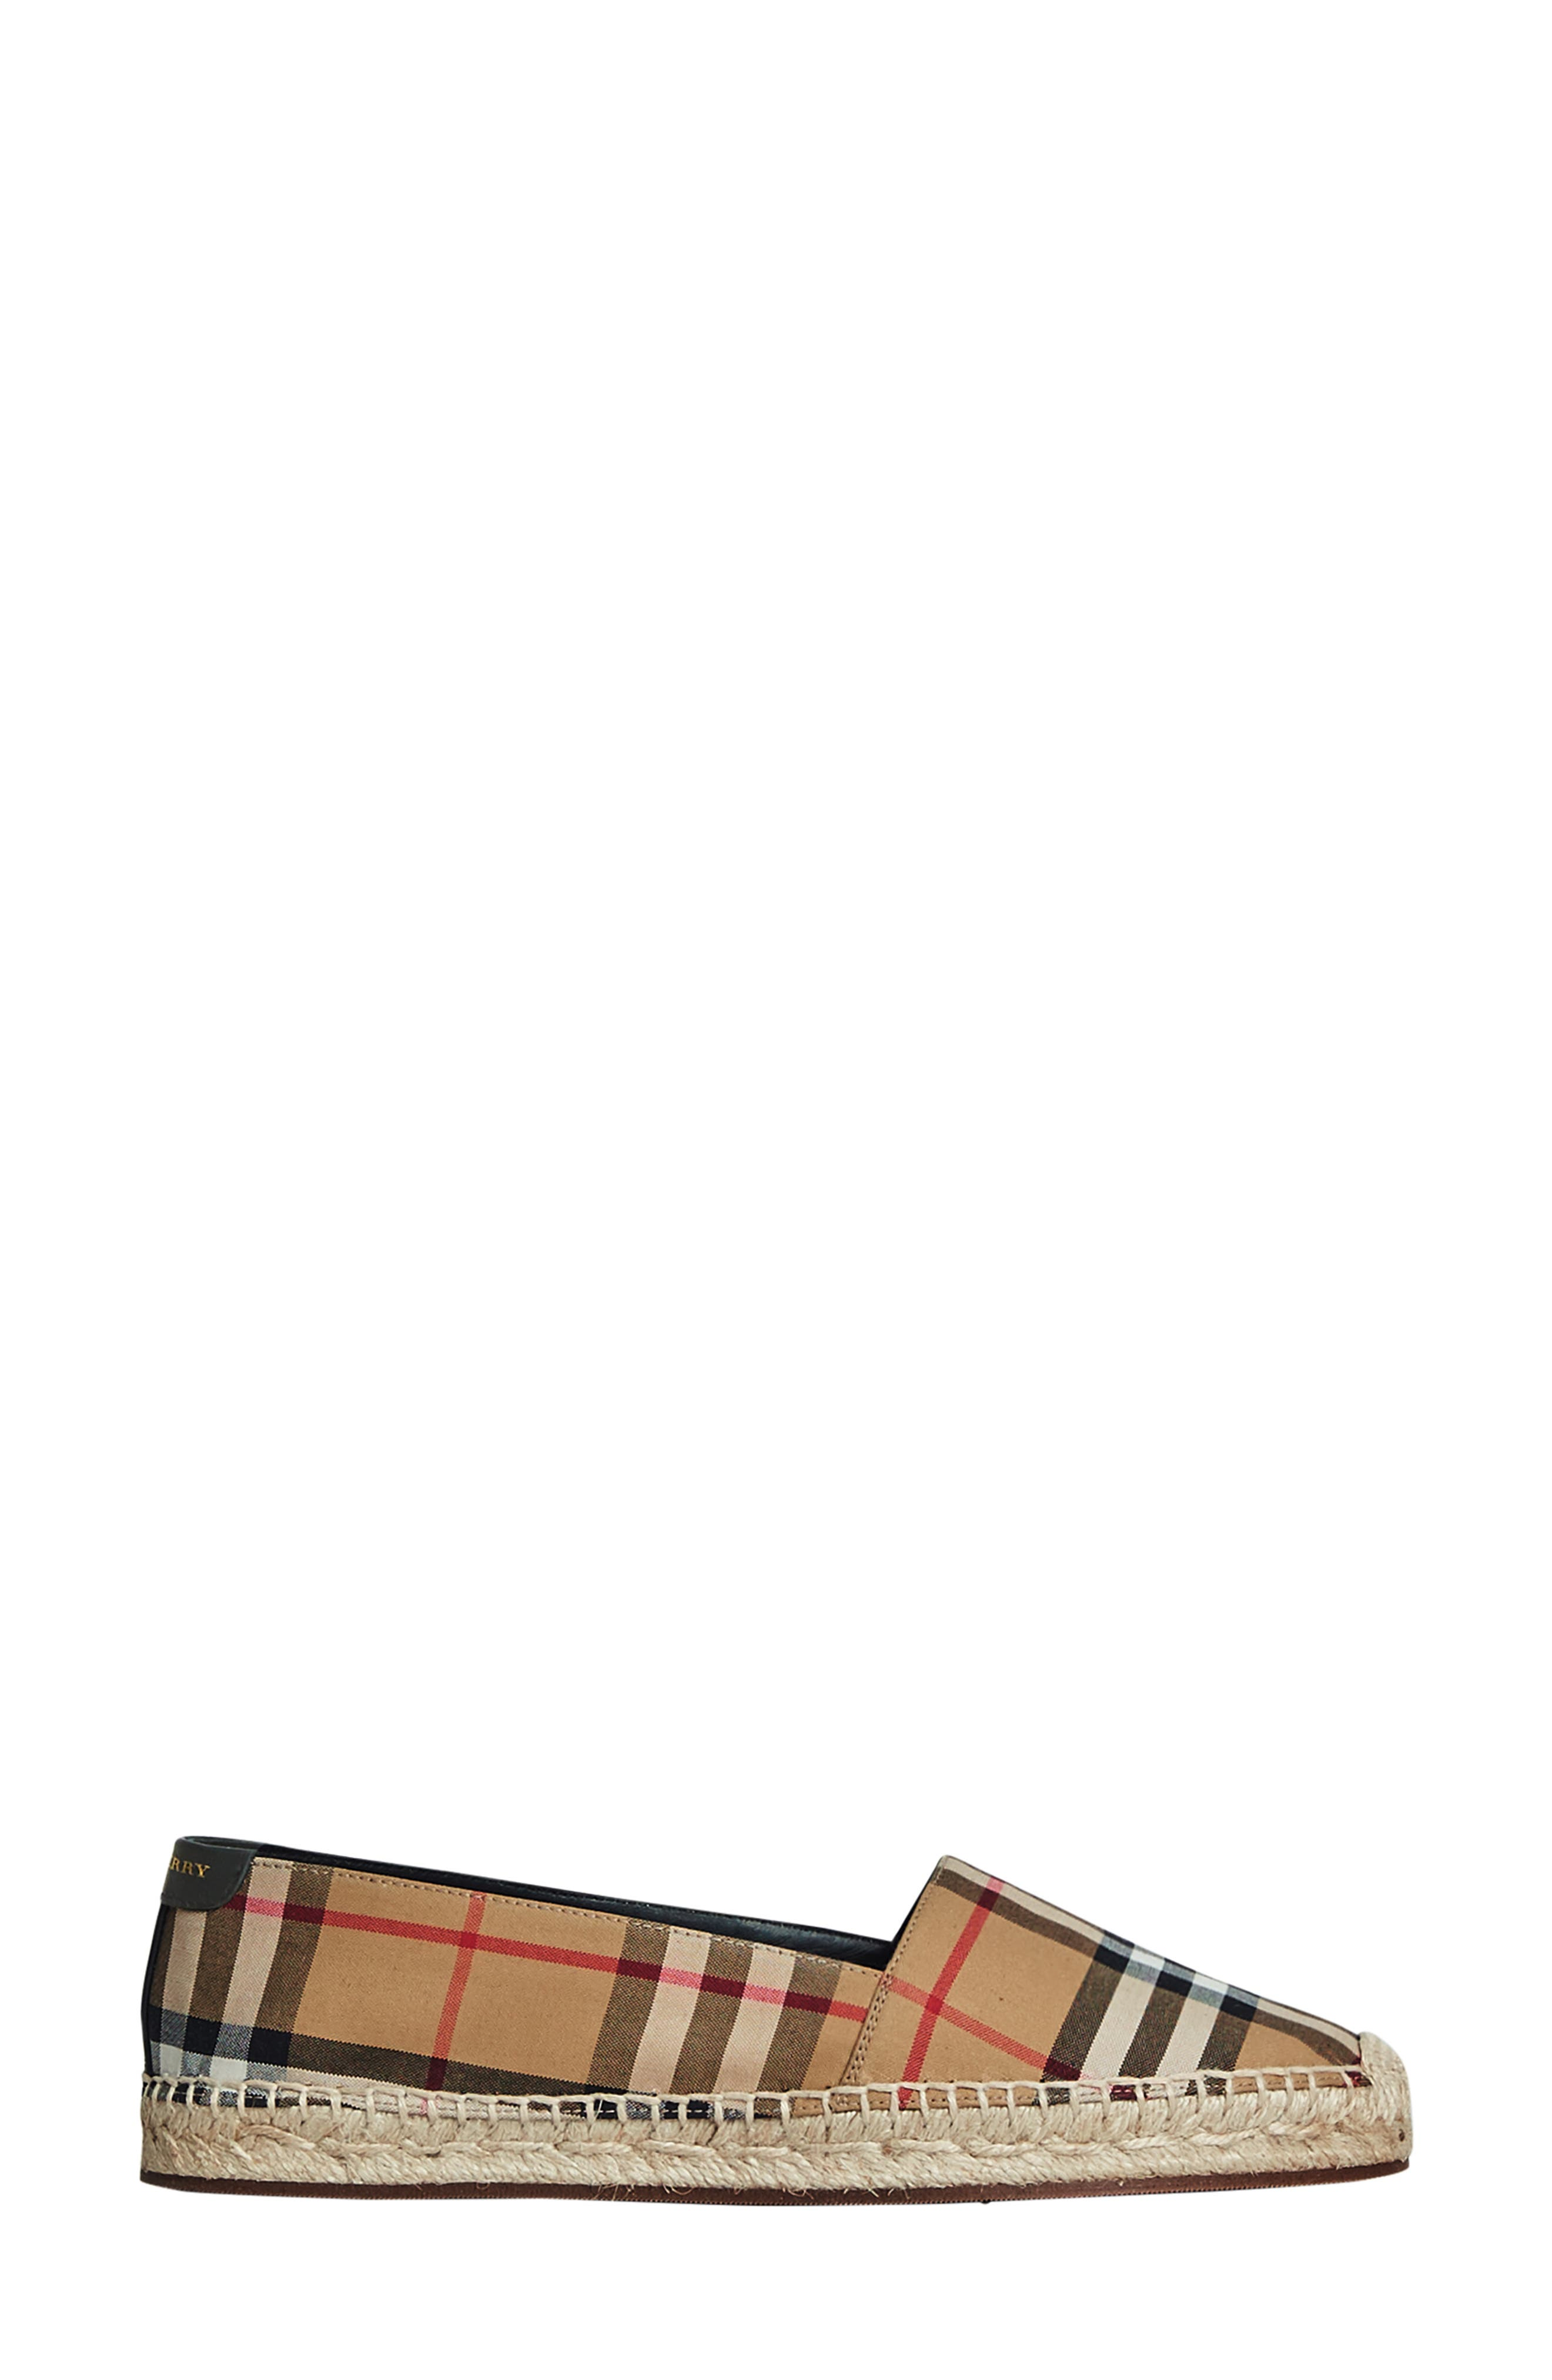 BURBERRY, Hodgeson Check Print Espadrille Flat, Alternate thumbnail 4, color, ANTIQUE YELLOW